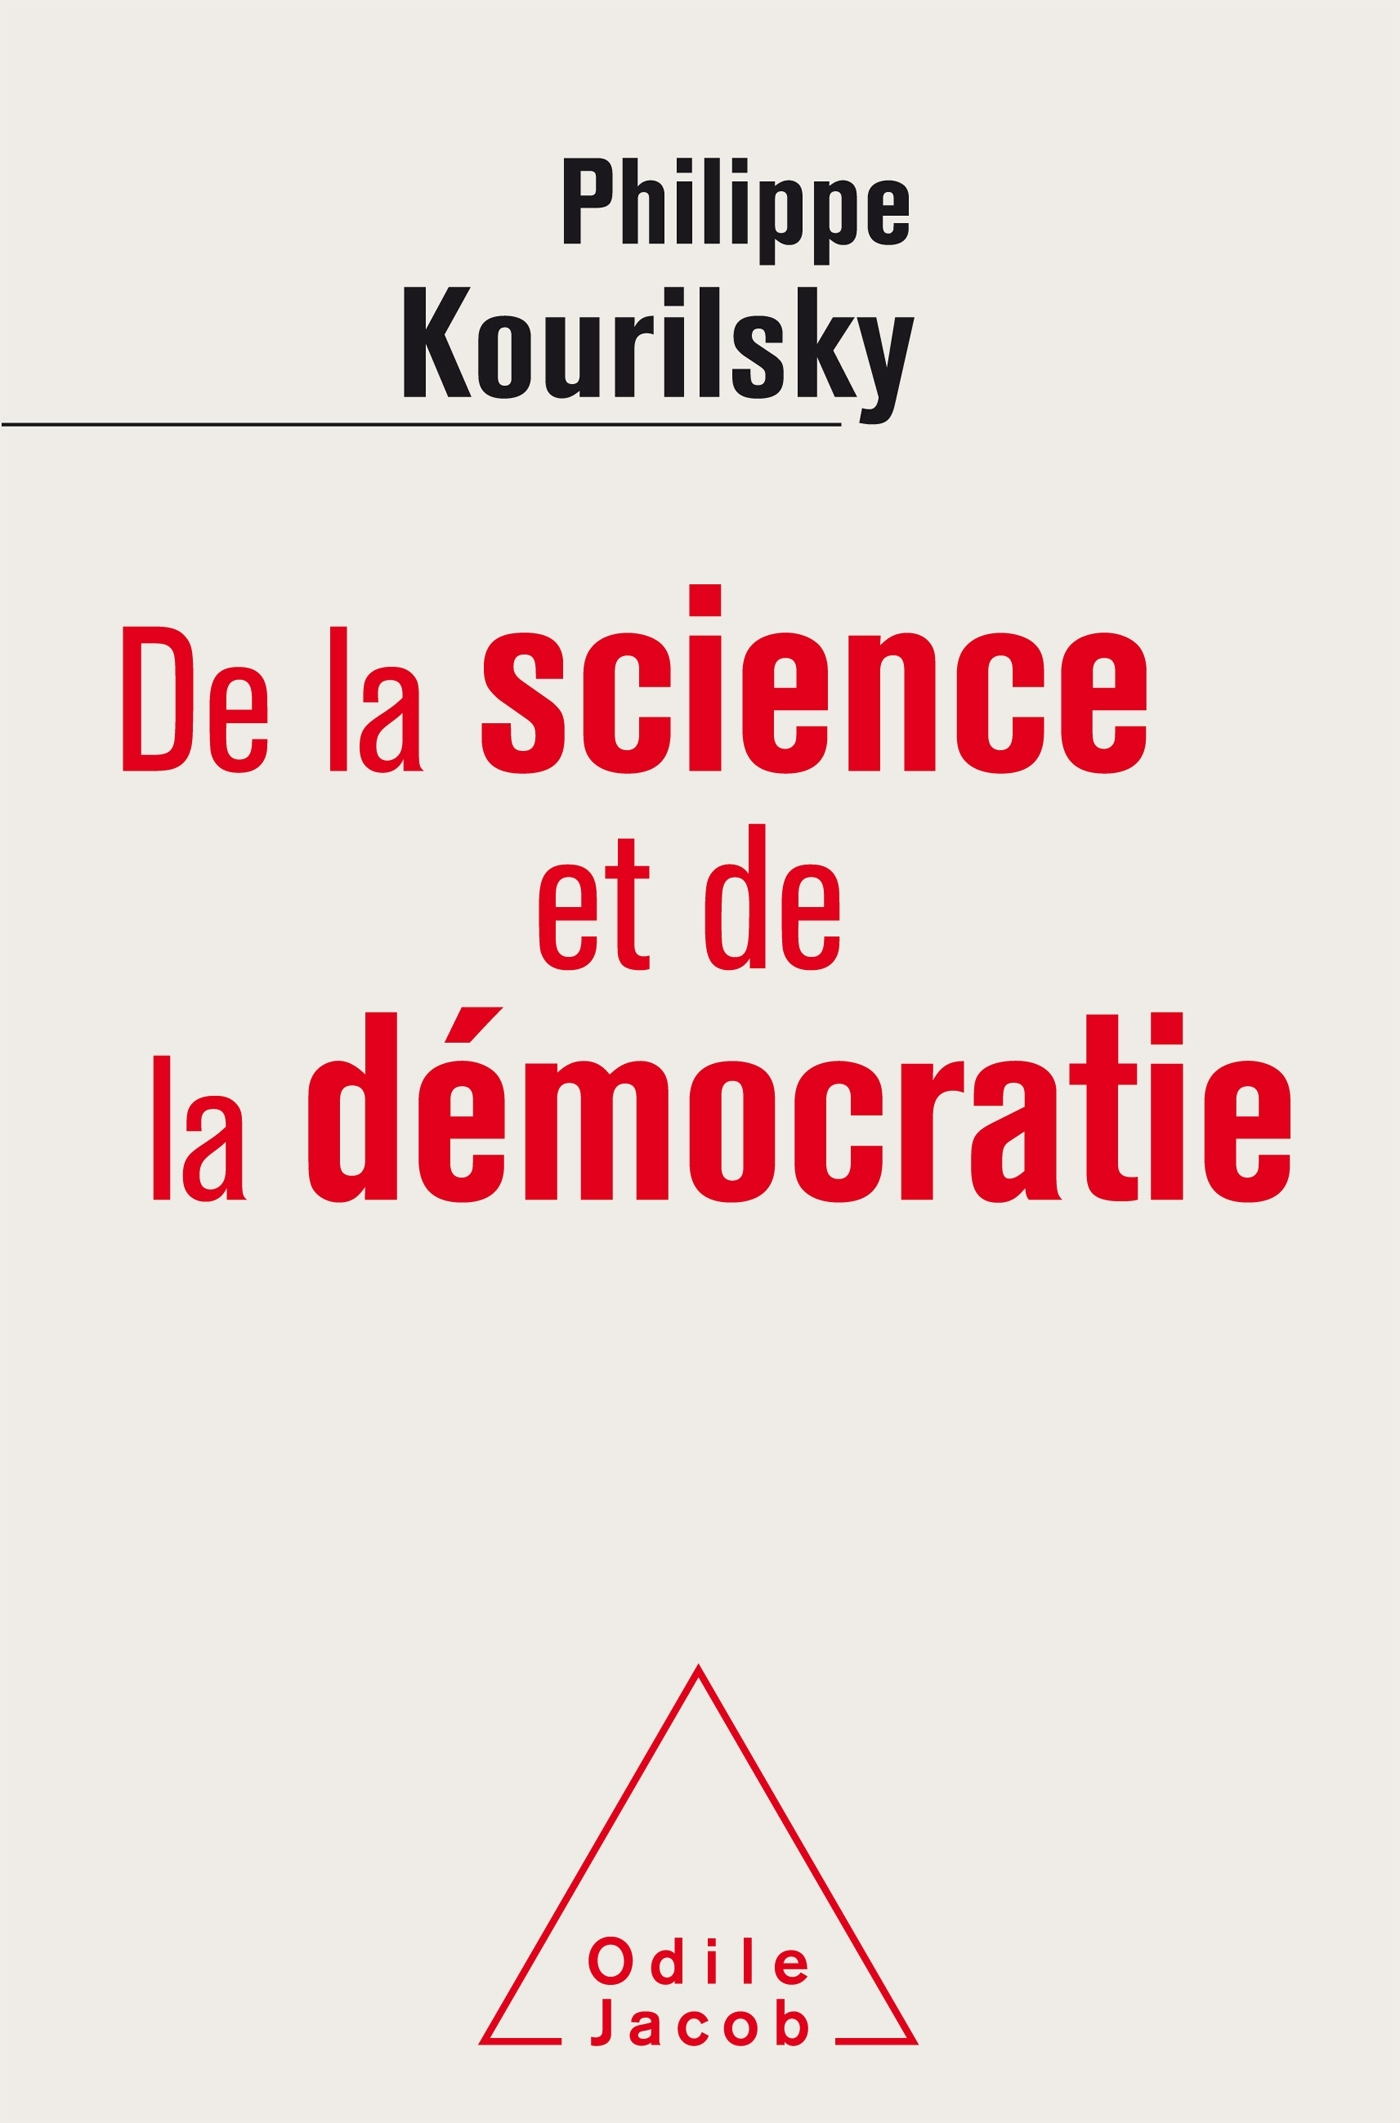 DE LA SCIENCE ET DE LA DEMOCRATIE